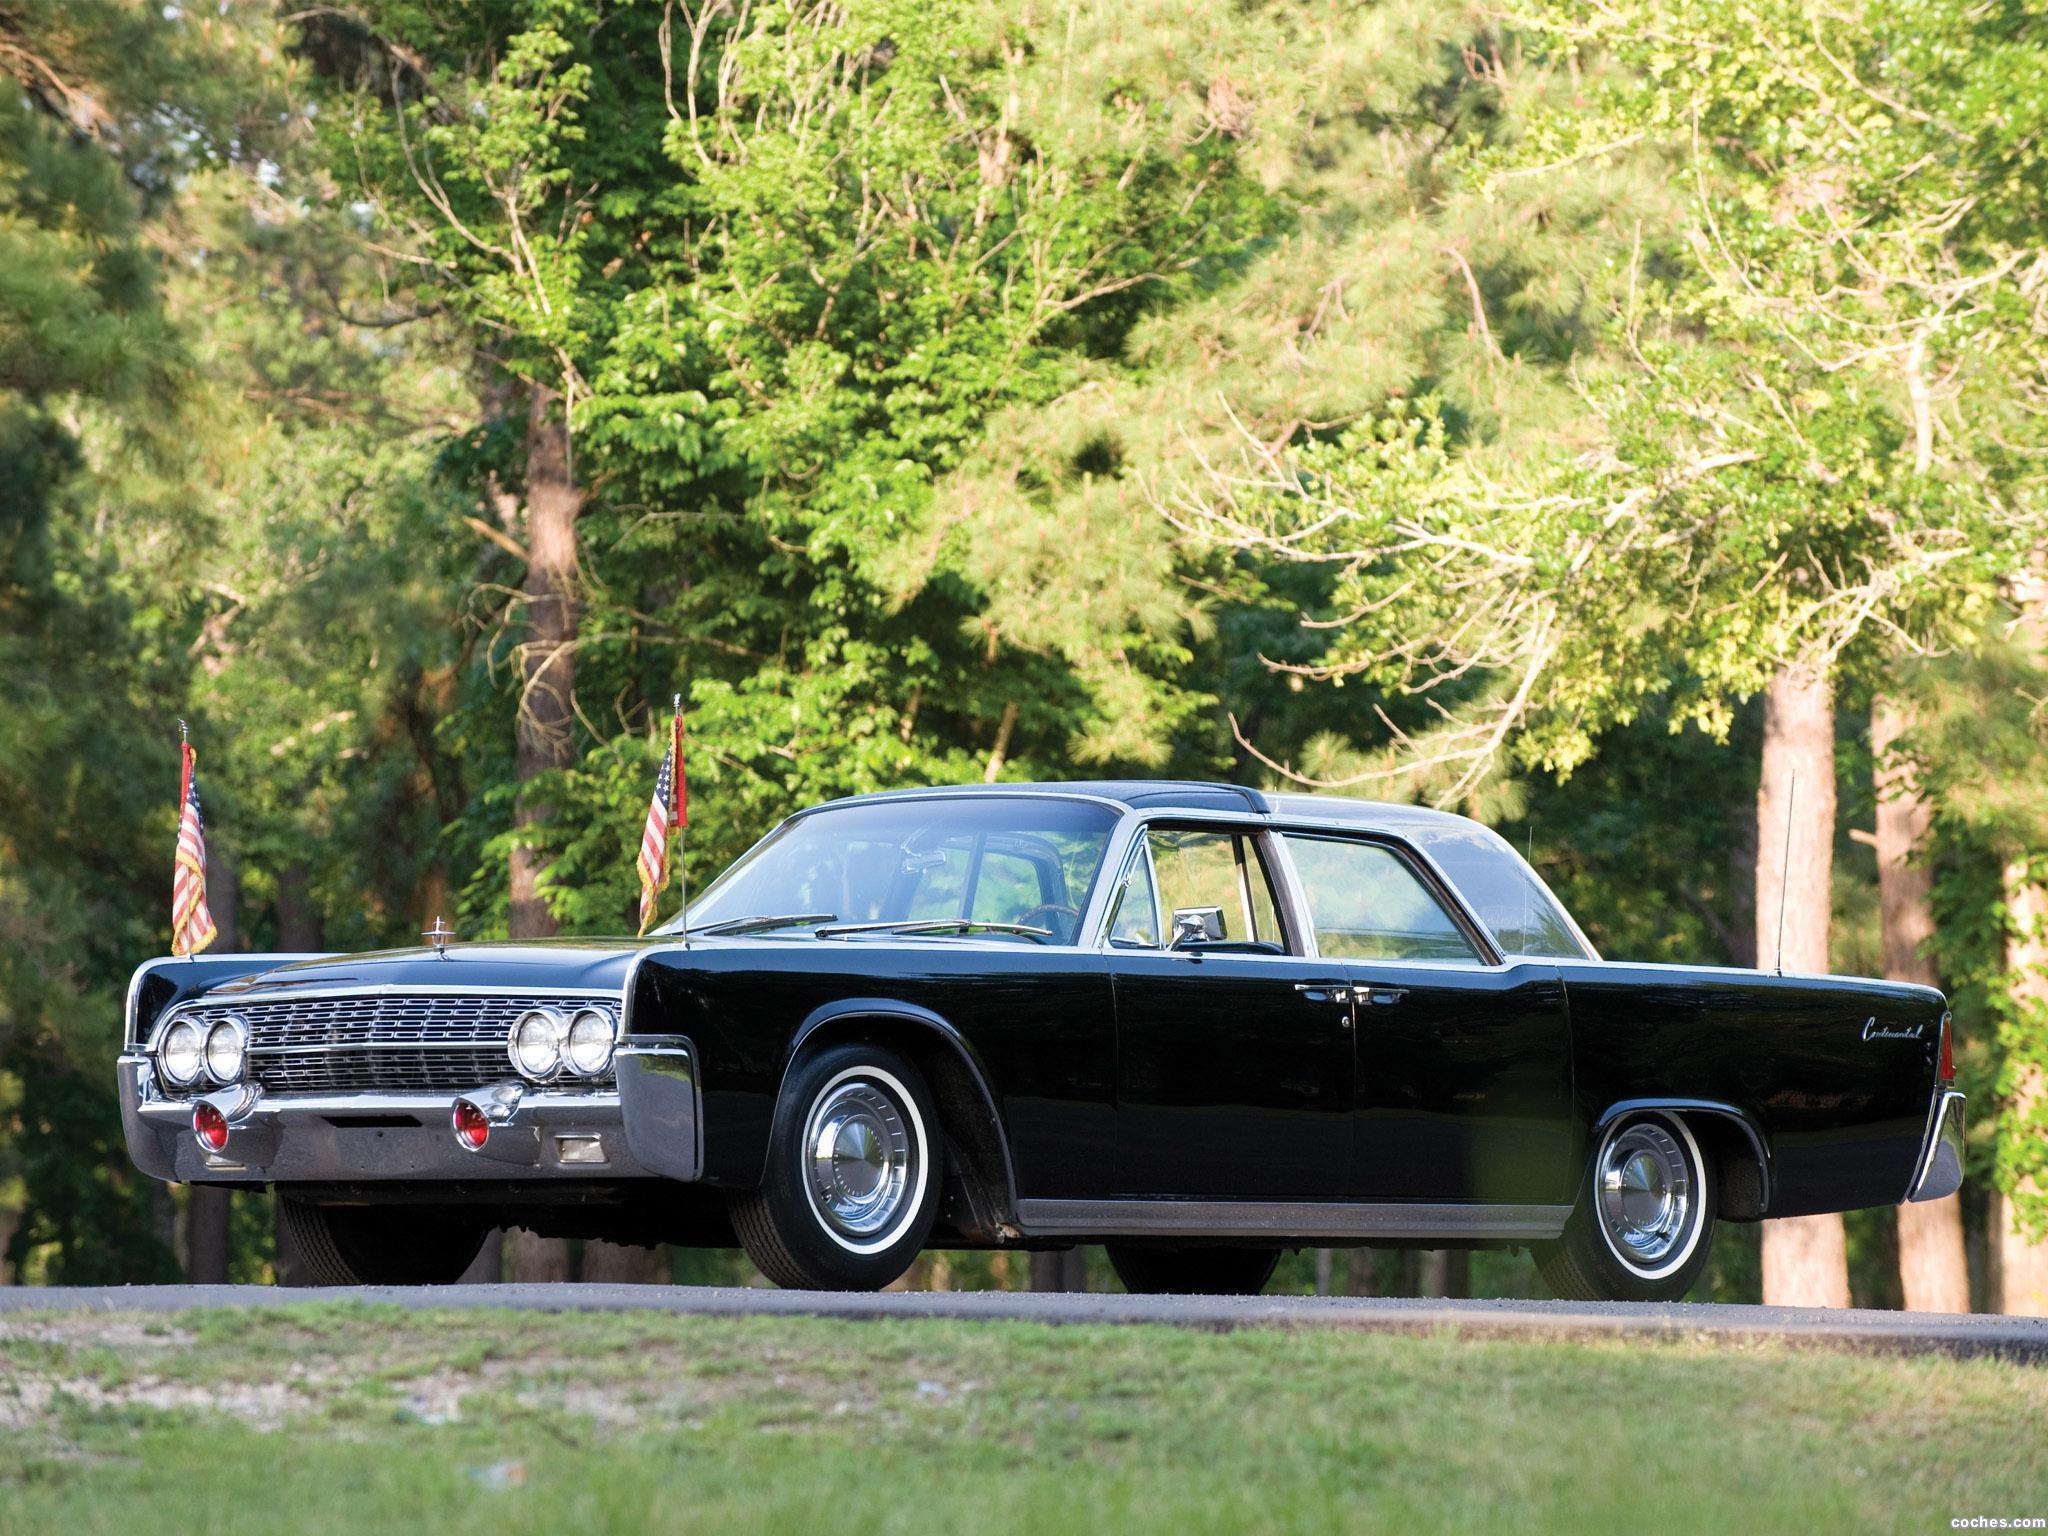 Foto 0 de Lincoln Continental Bubbletop Kennedy Limousine 1962